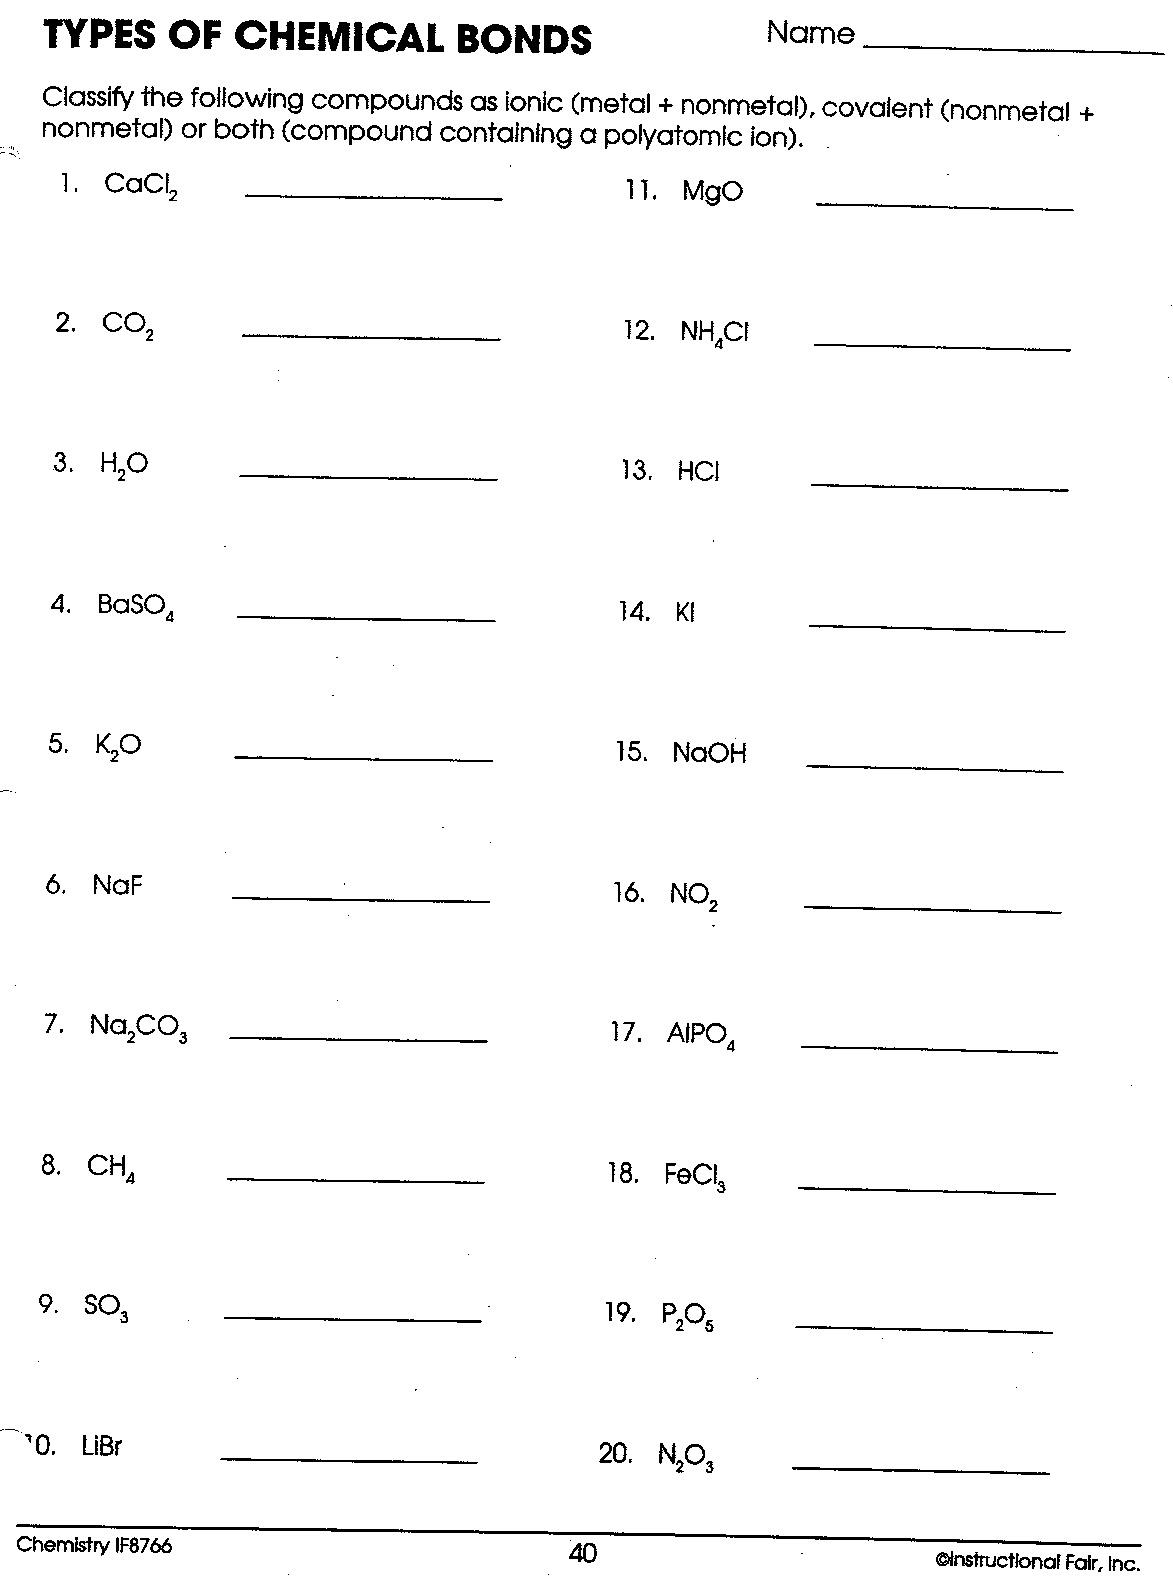 Ionic And Covalent Bonds Lewis Structure Worksheet - Amashusho Inside Lewis Structure Practice Worksheet